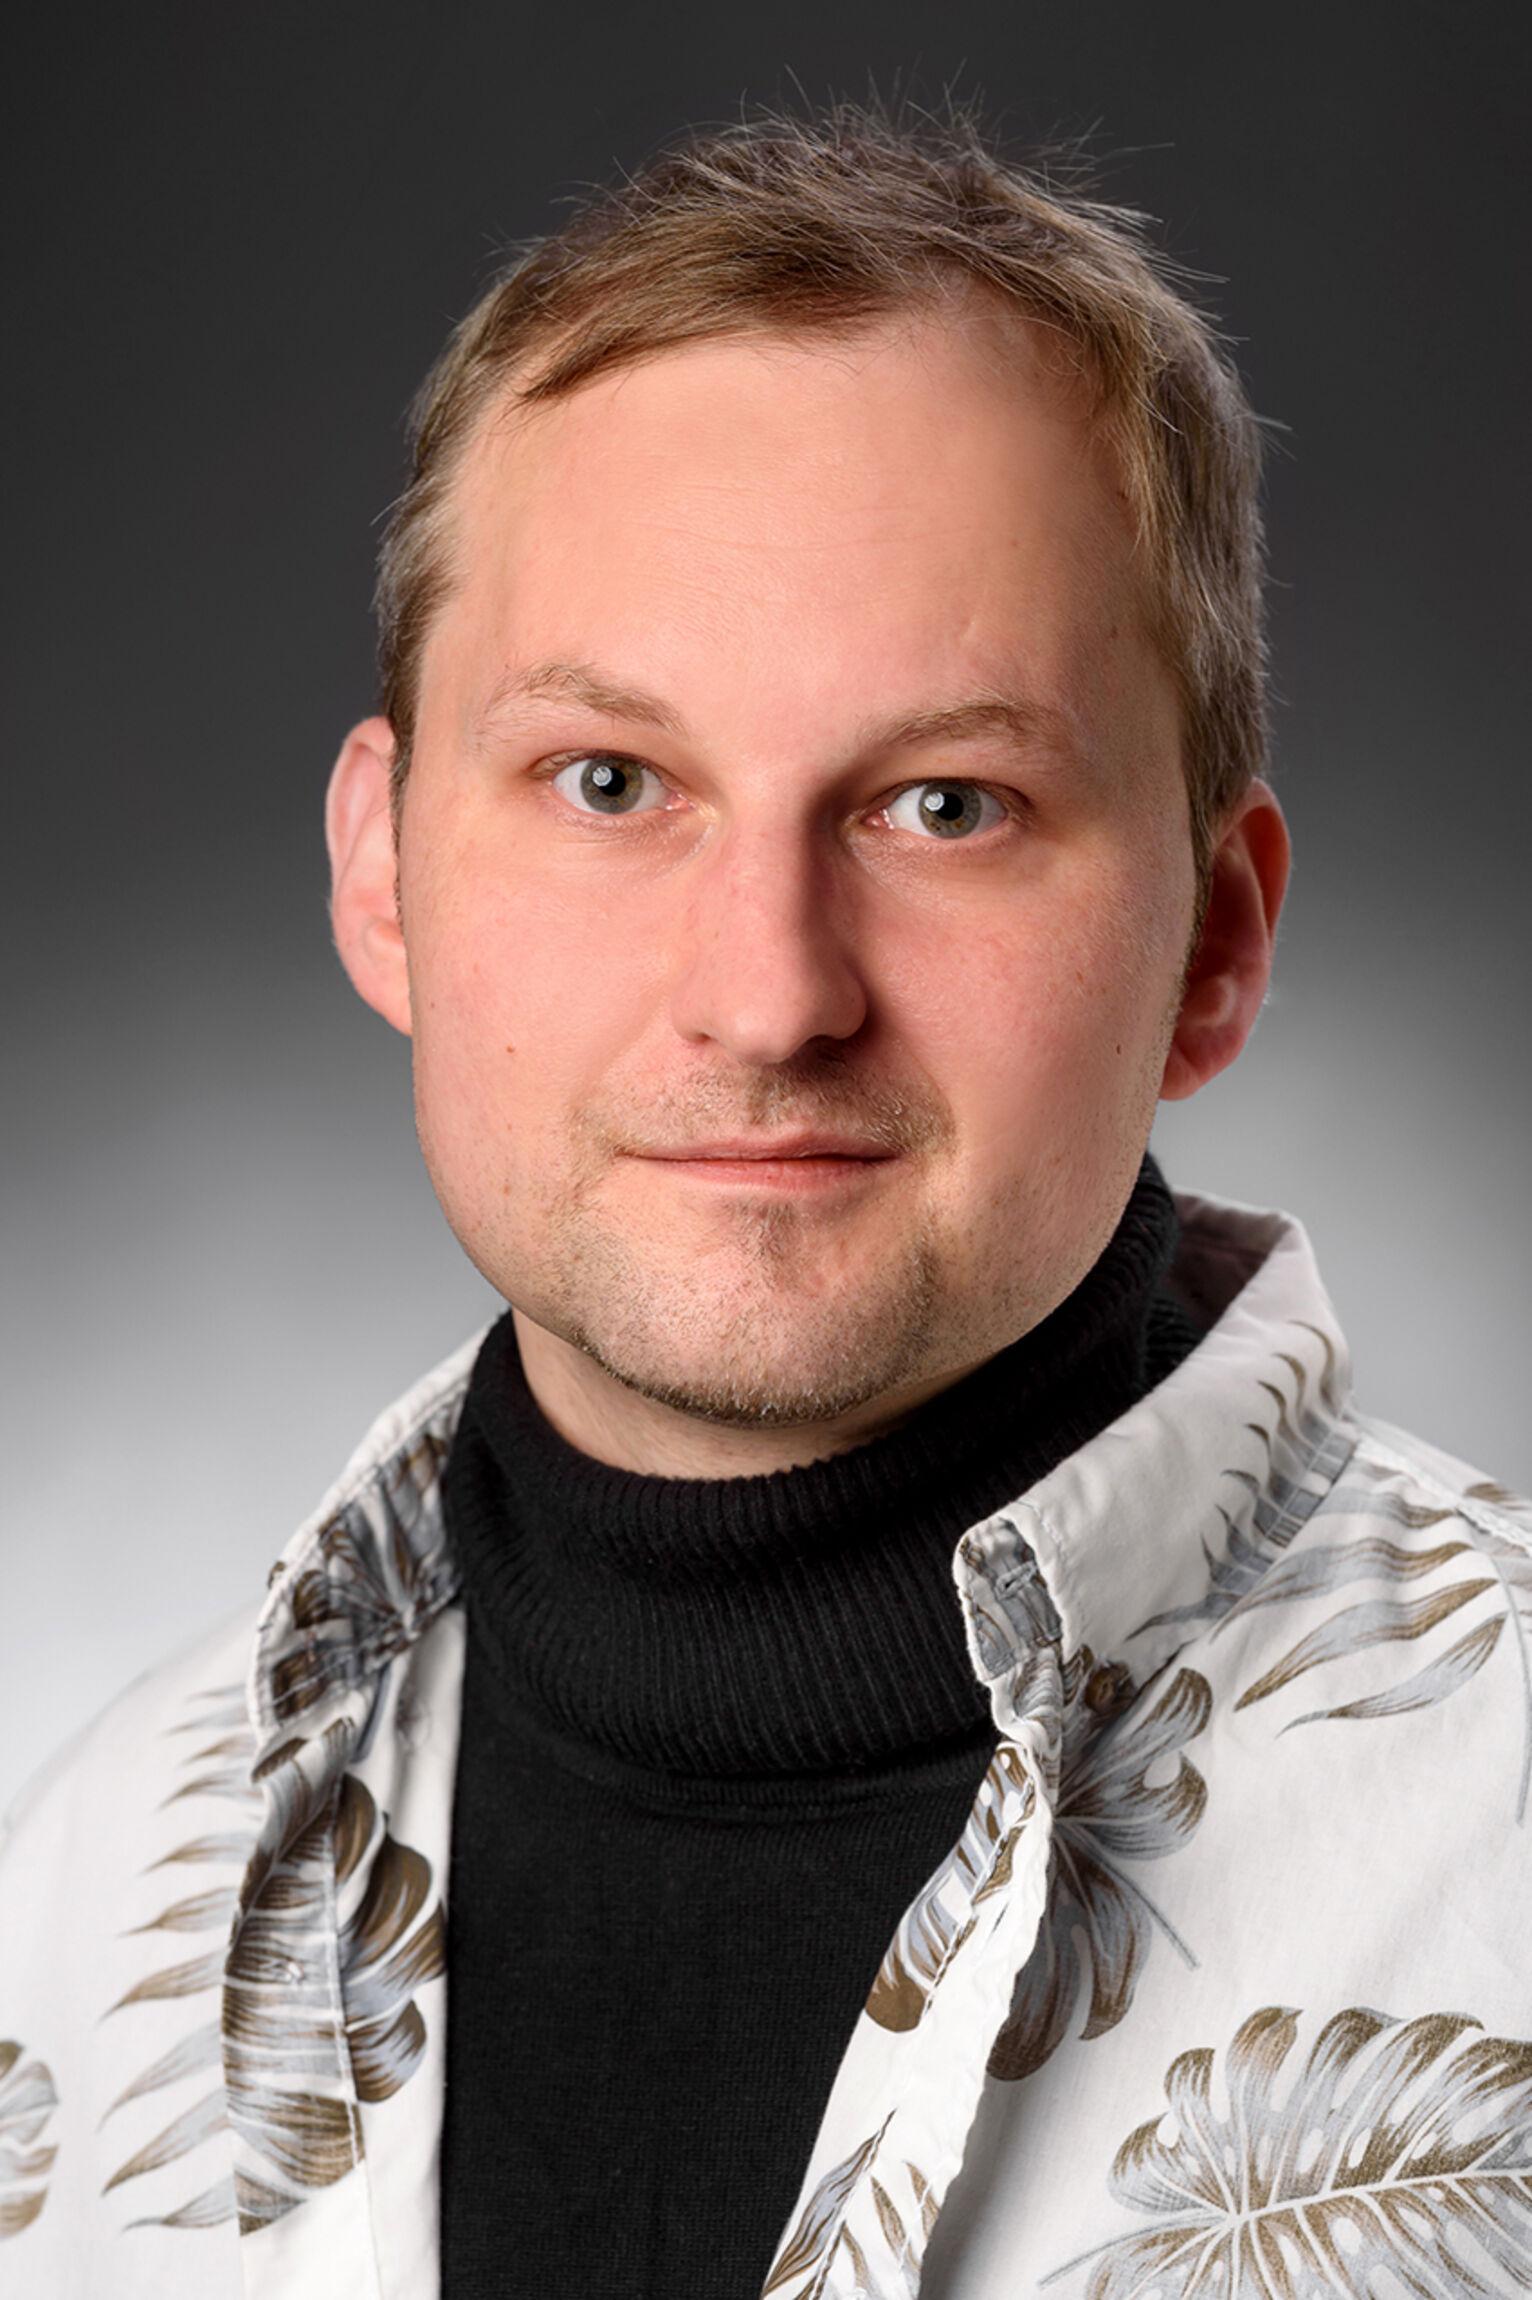 Daniel Ringwelski